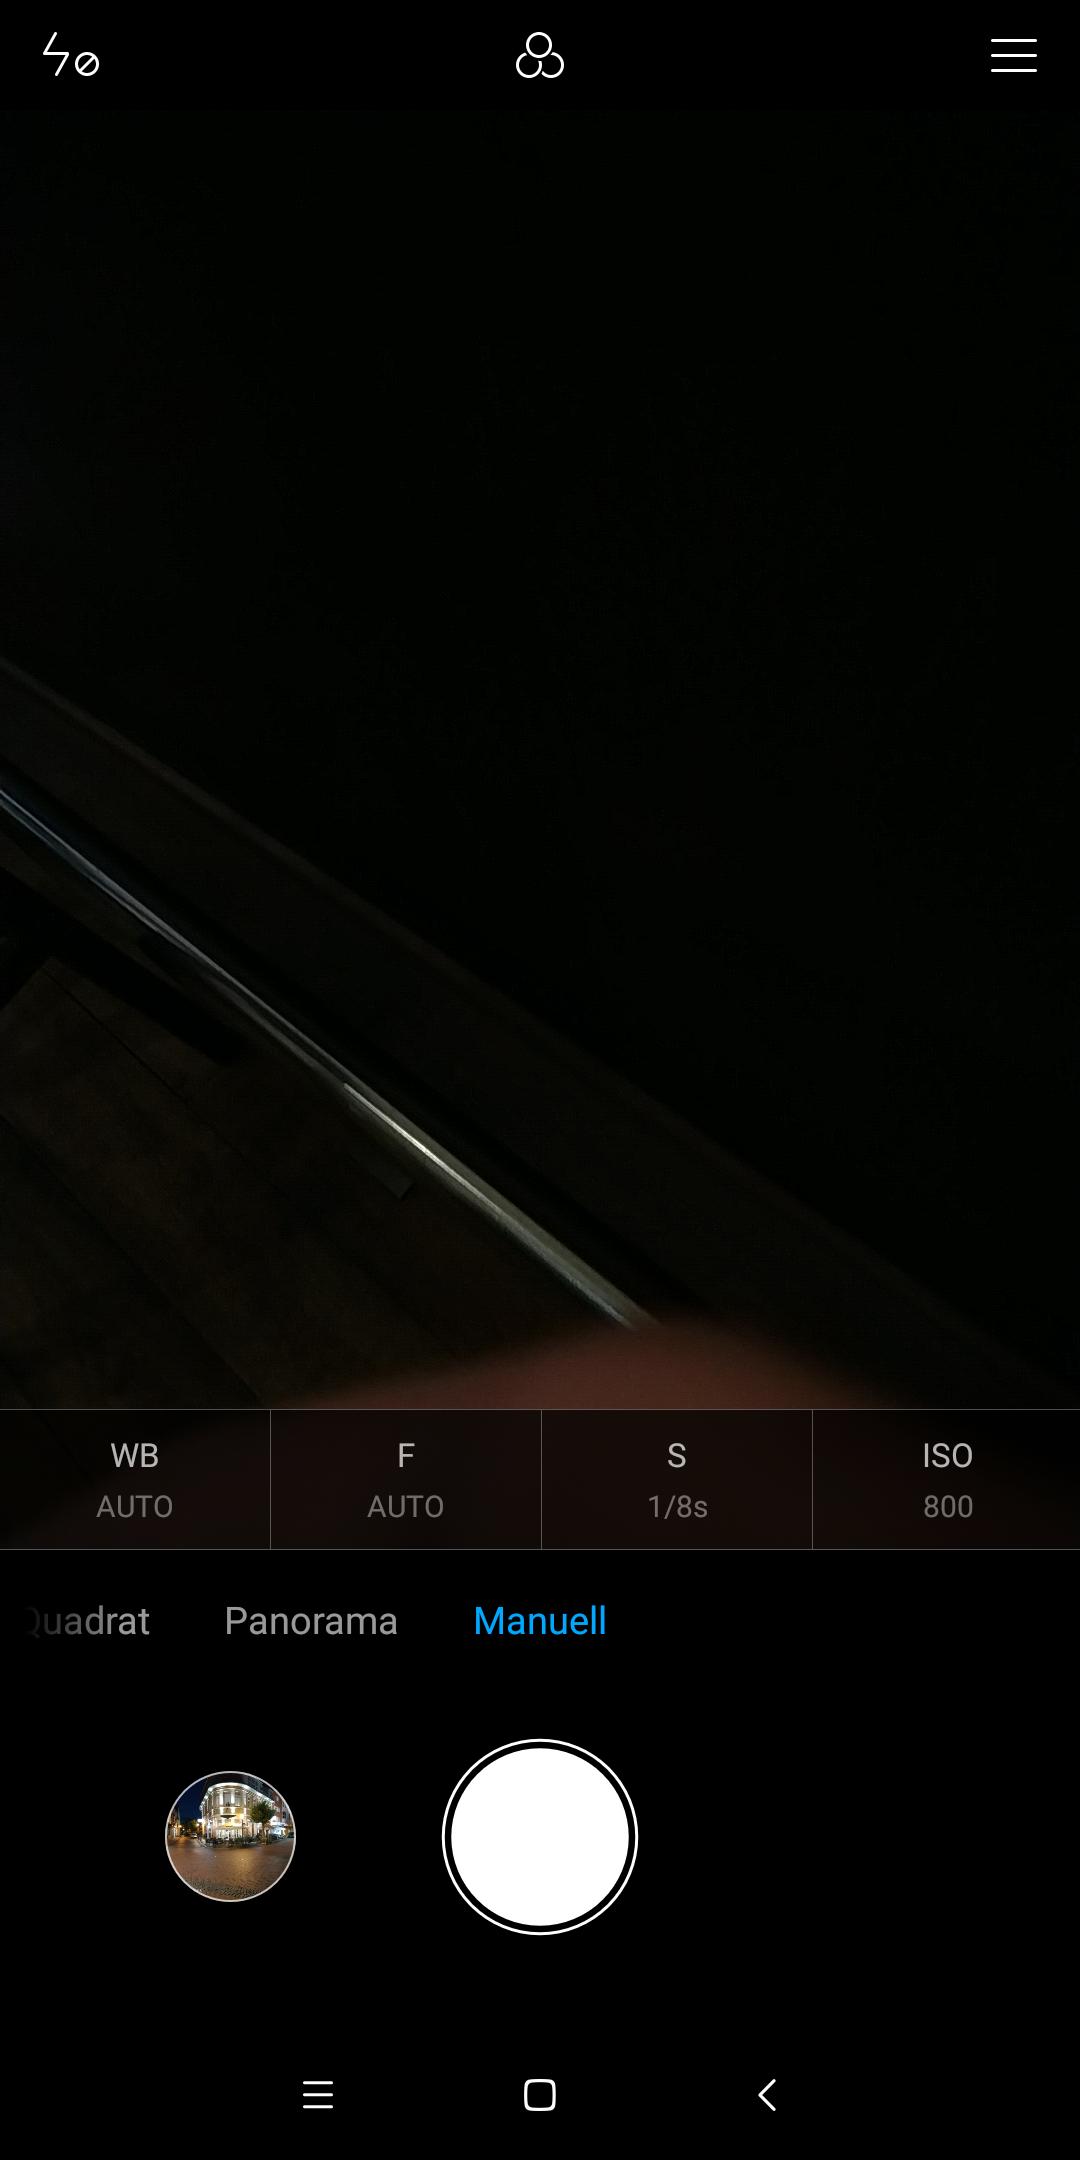 Screenshot_2018-09-15-21-09-46-412_com.android.camera.png